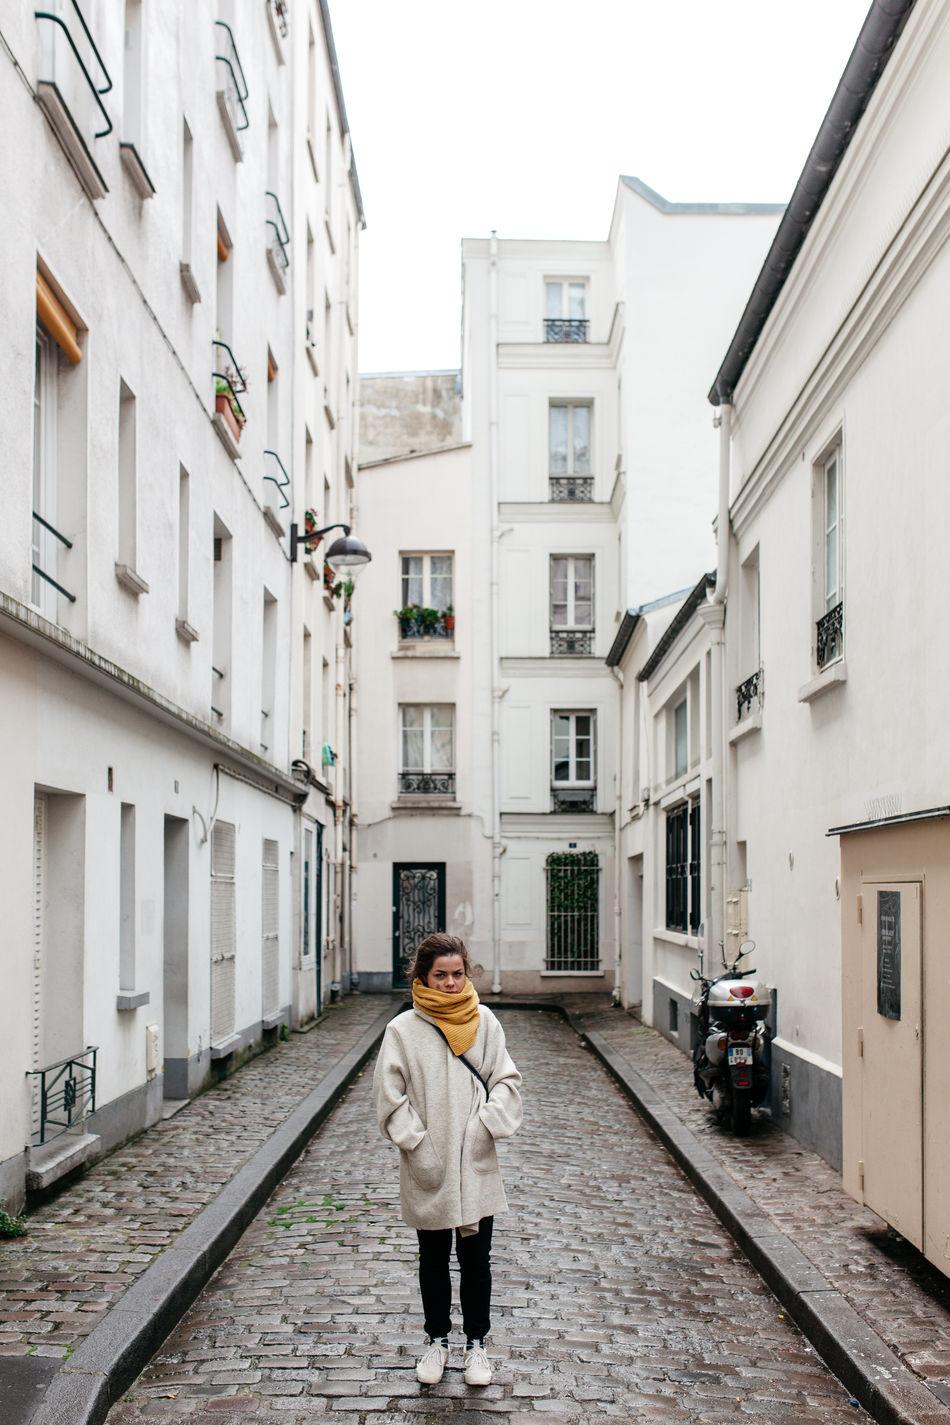 Beautiful stock photos of paris, 20-24 Years, Architecture, Building, Building Exterior